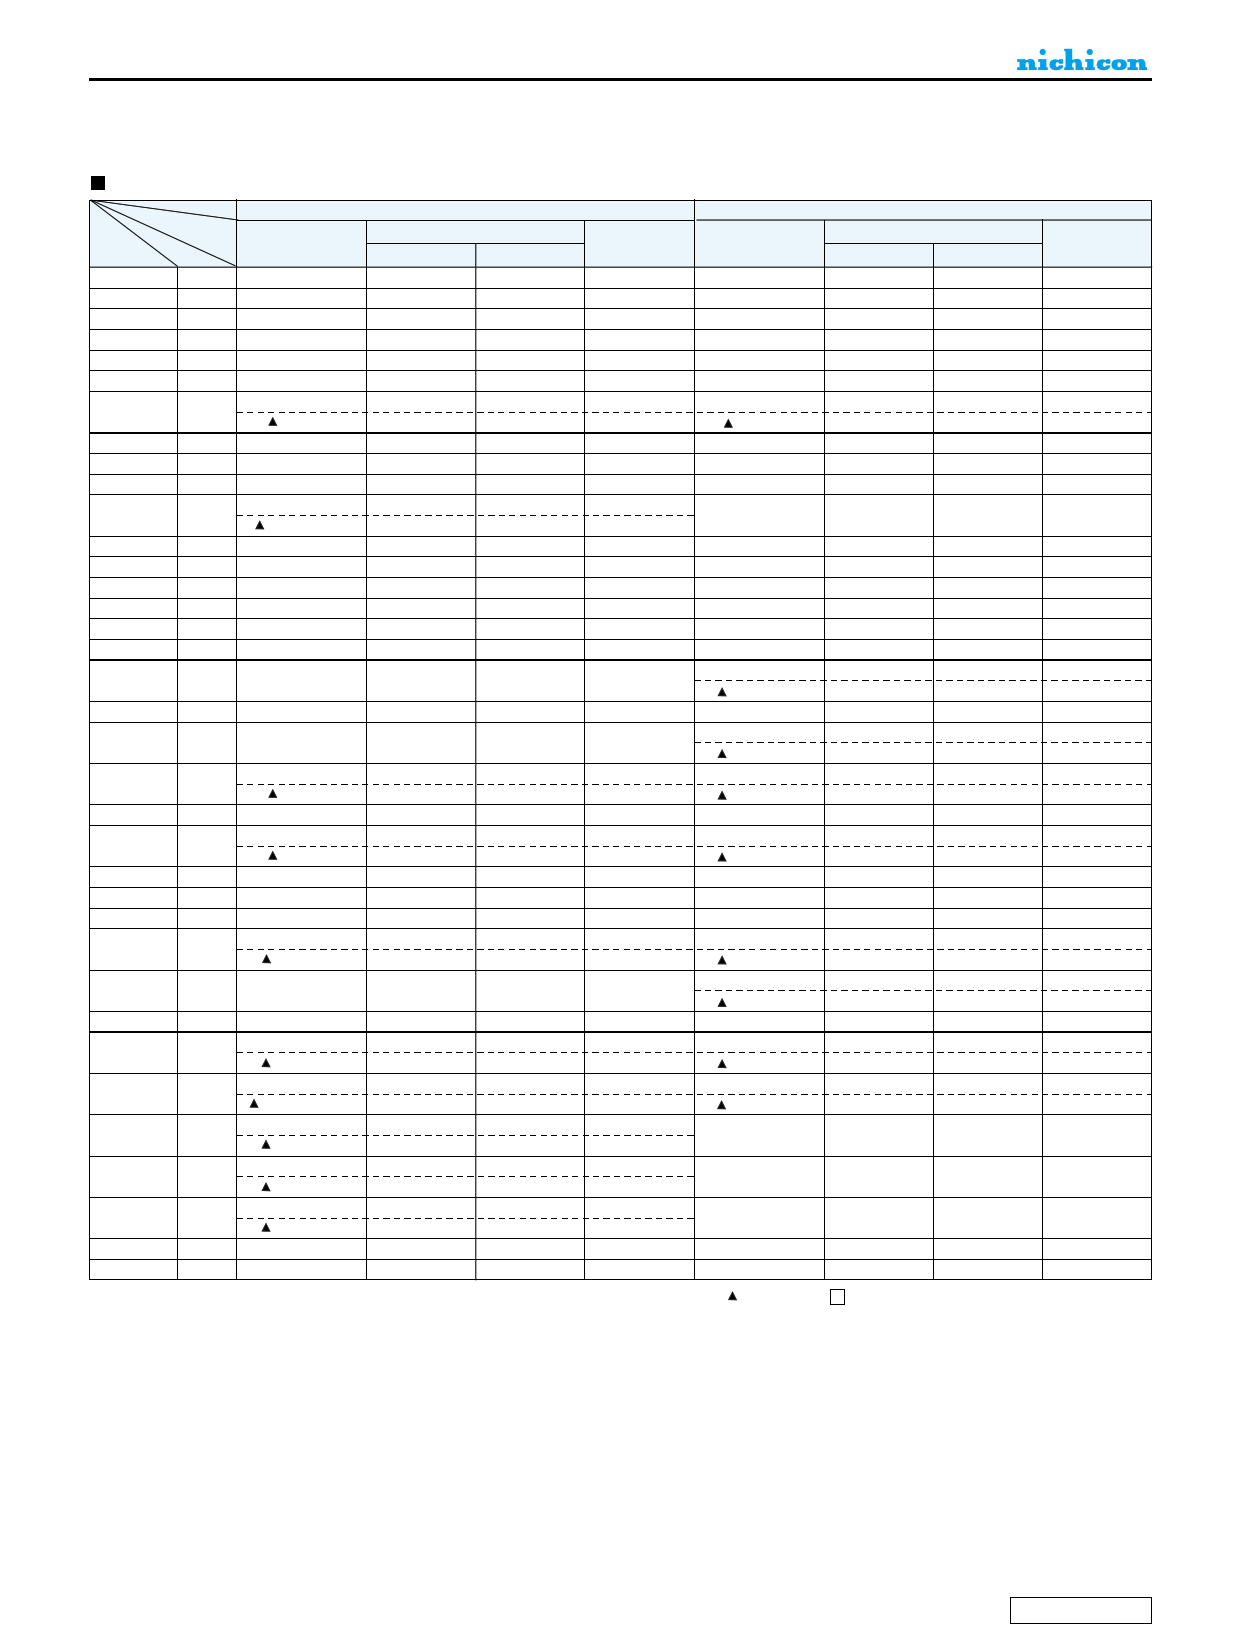 UPW1V221MPD6 pdf, 반도체, 판매, 대치품